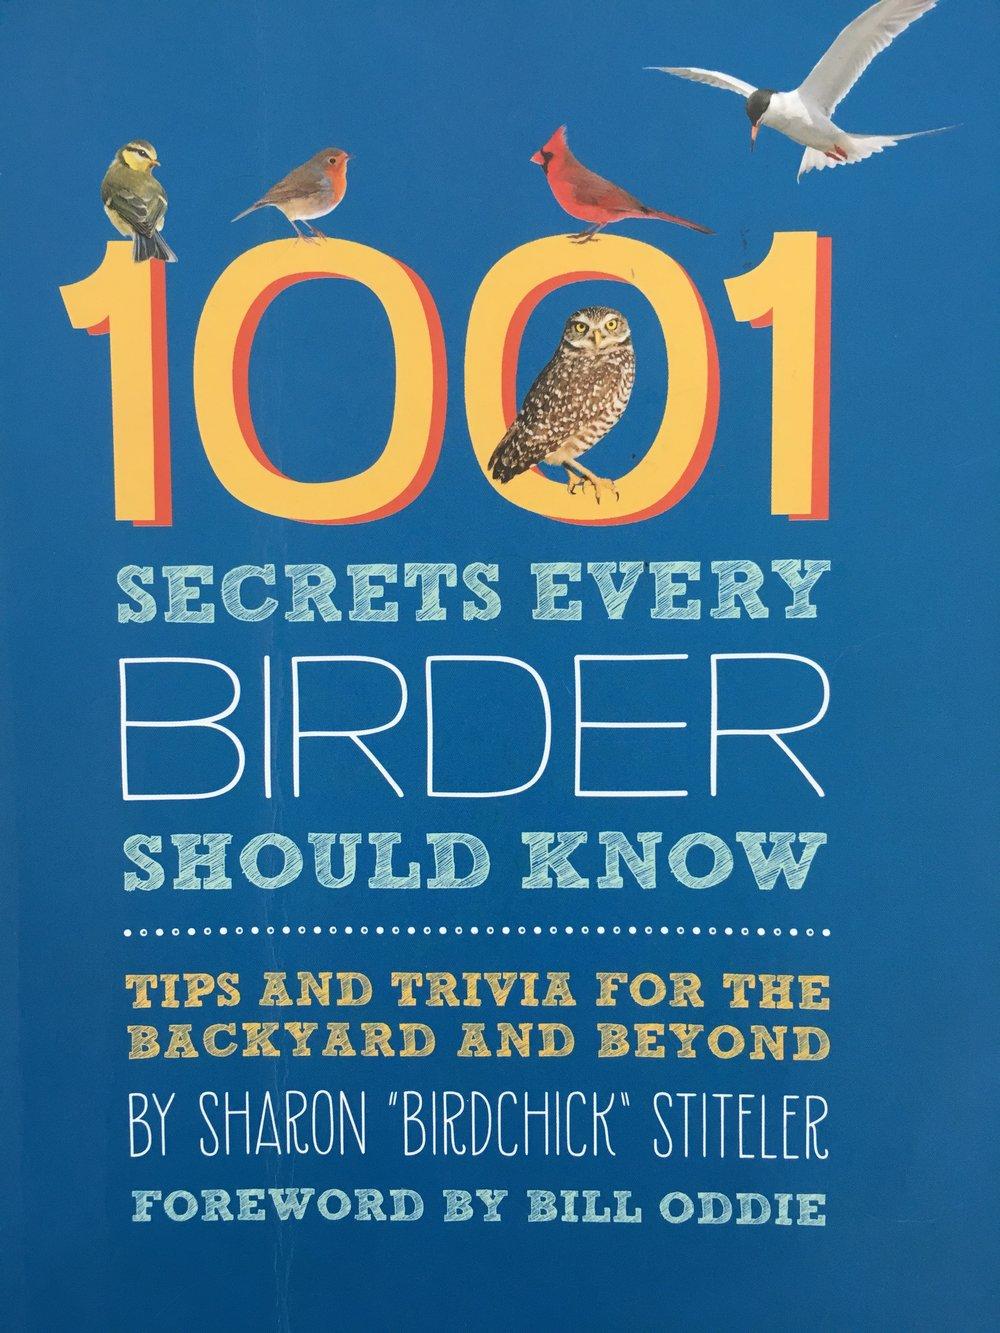 1001 Secrets every Birder should know.jpg